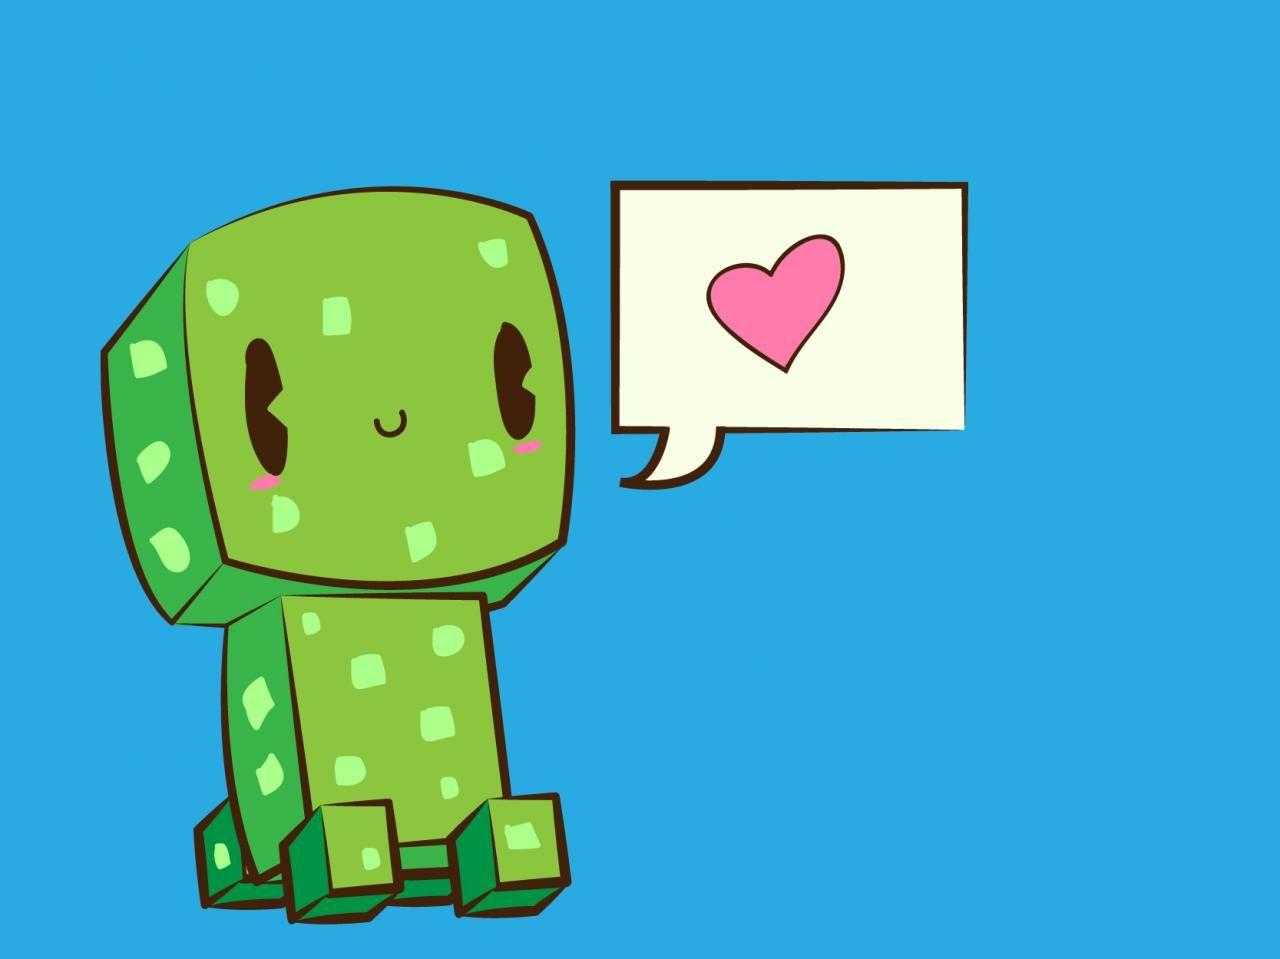 Beautiful Wallpaper Minecraft Cute - 89aaed805ac1ca8170ac2a092b2a6245  You Should Have_518293.jpg